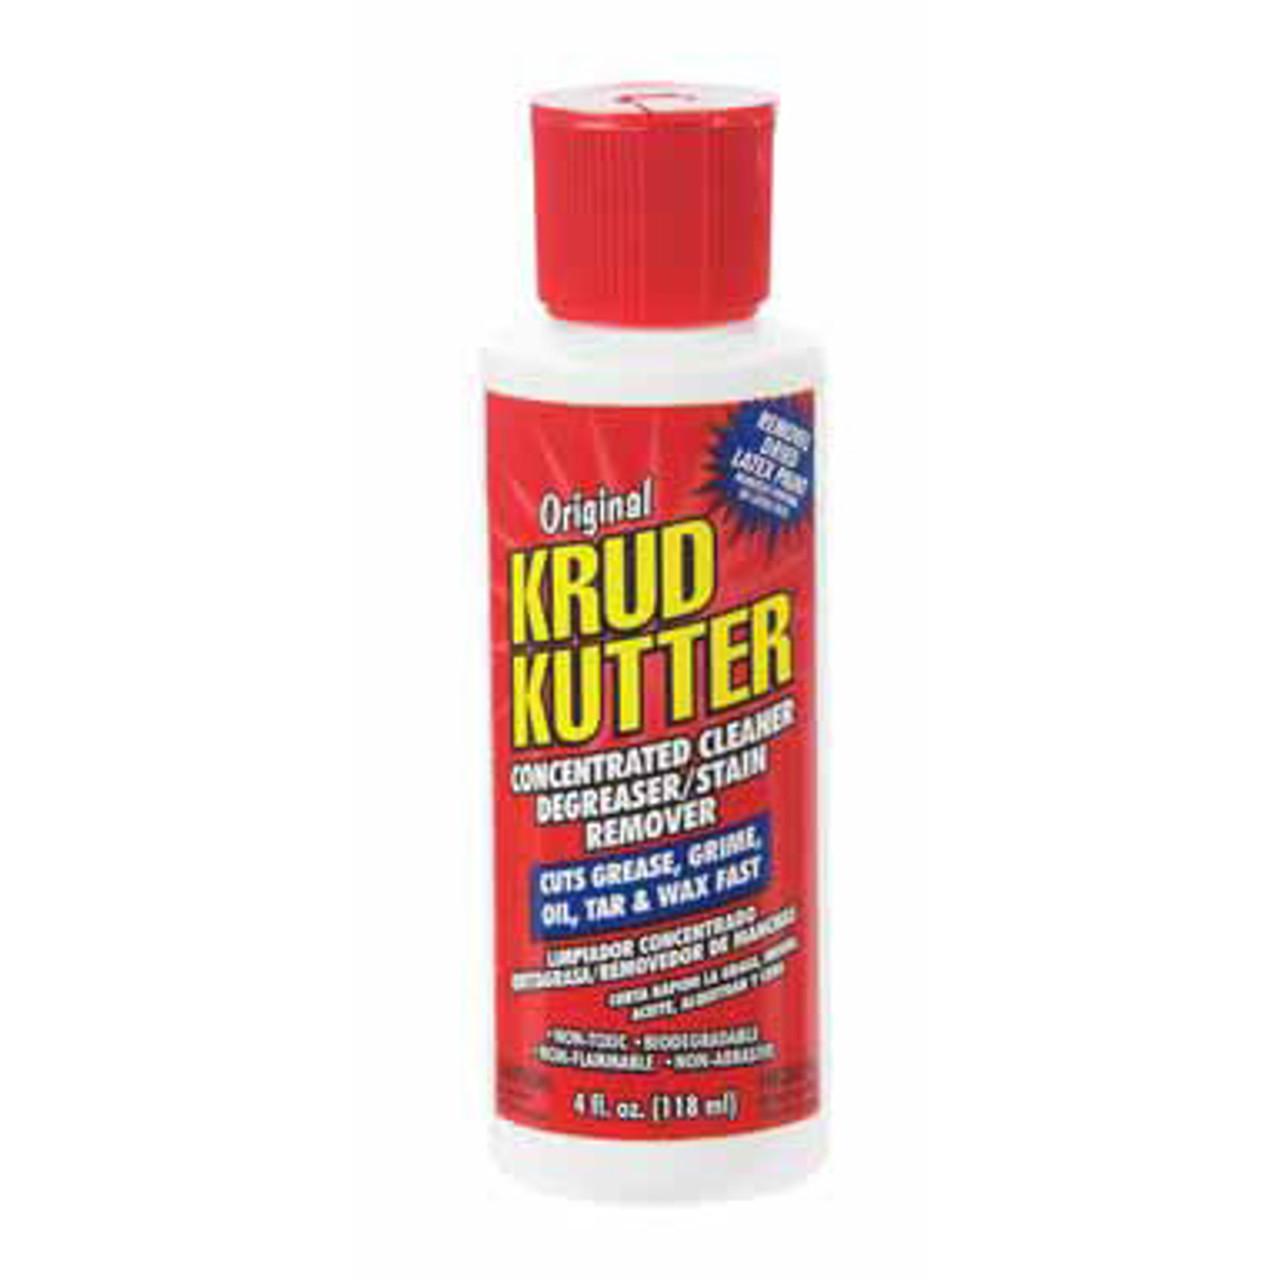 Krud Kutter Original Concentrated Cleaner